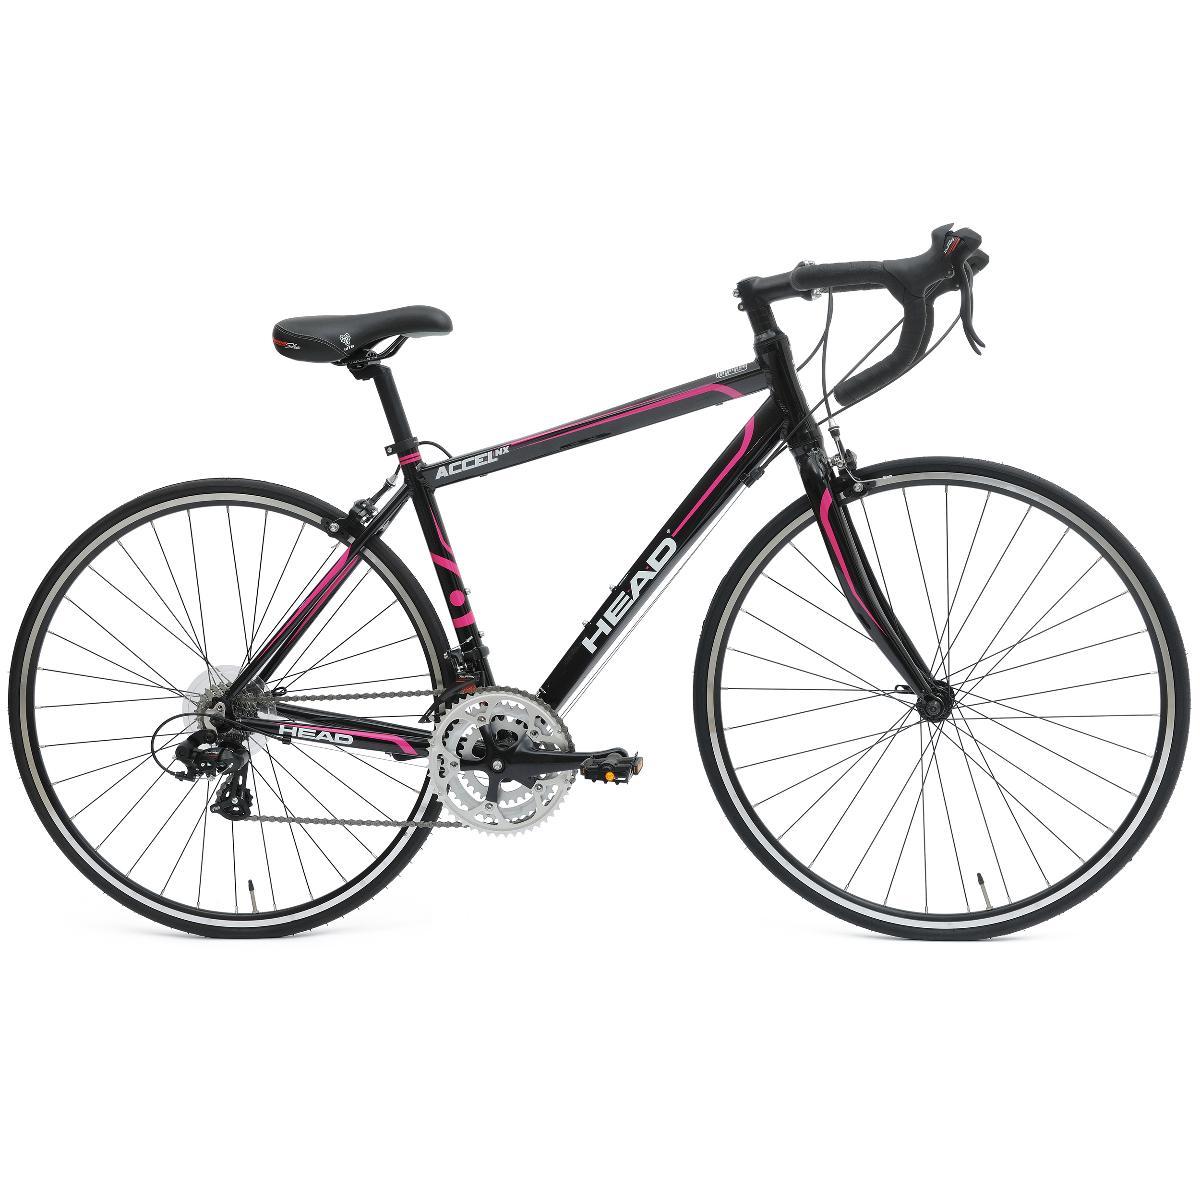 Head Bicycle Accel NXL 700C Road Bicycle